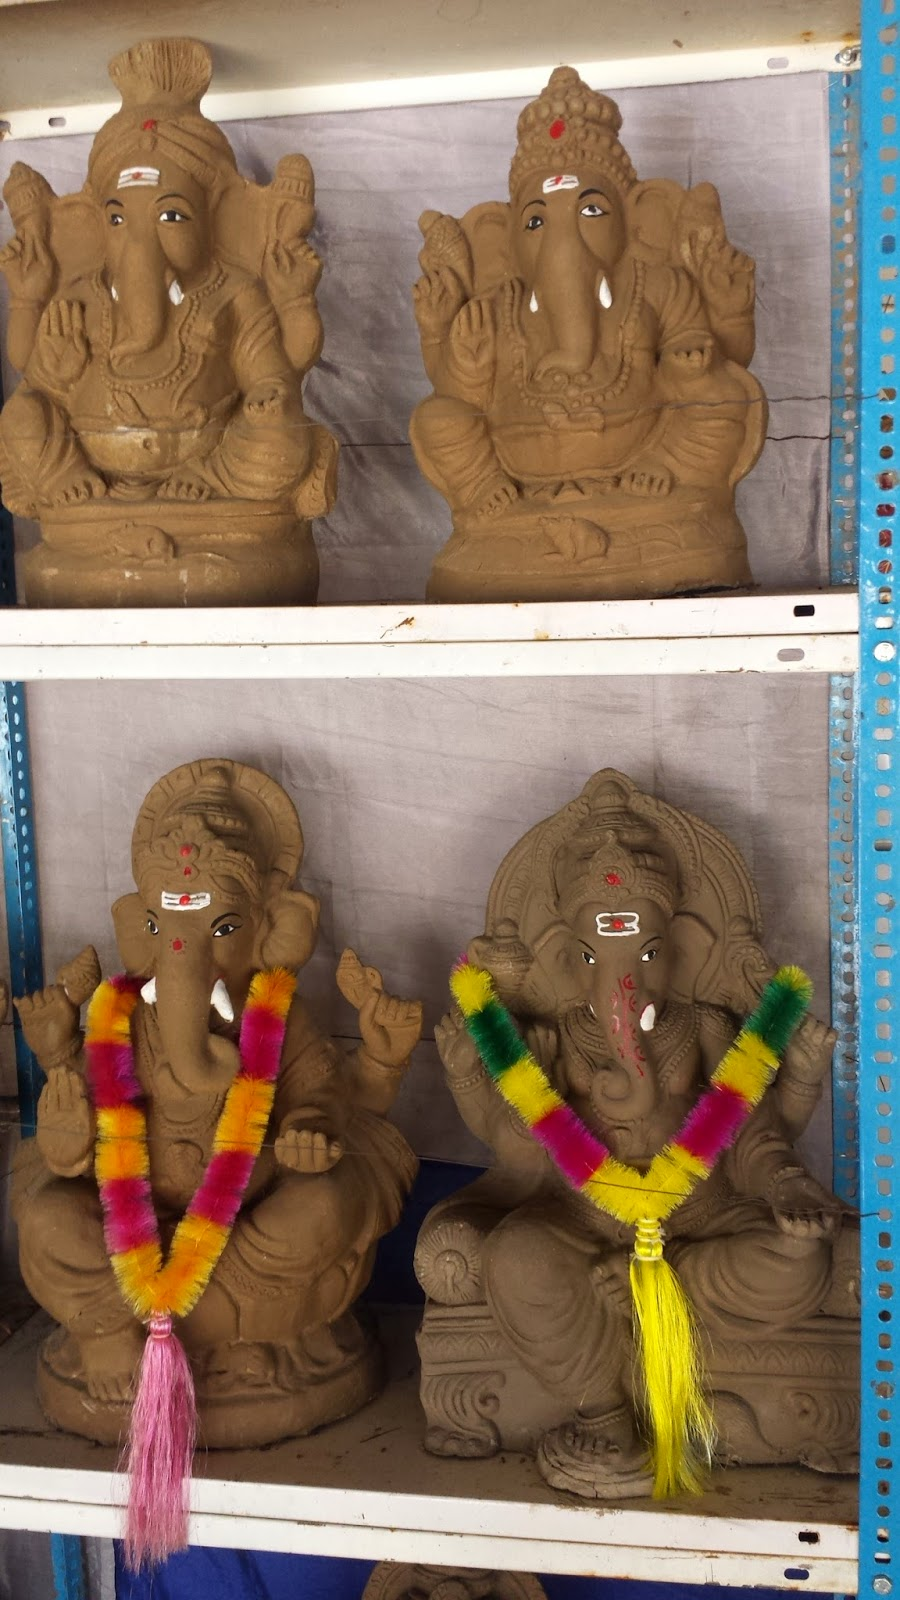 clay ganesh idols, matti vinayaka vigrahalu at nizampet, kukatpally